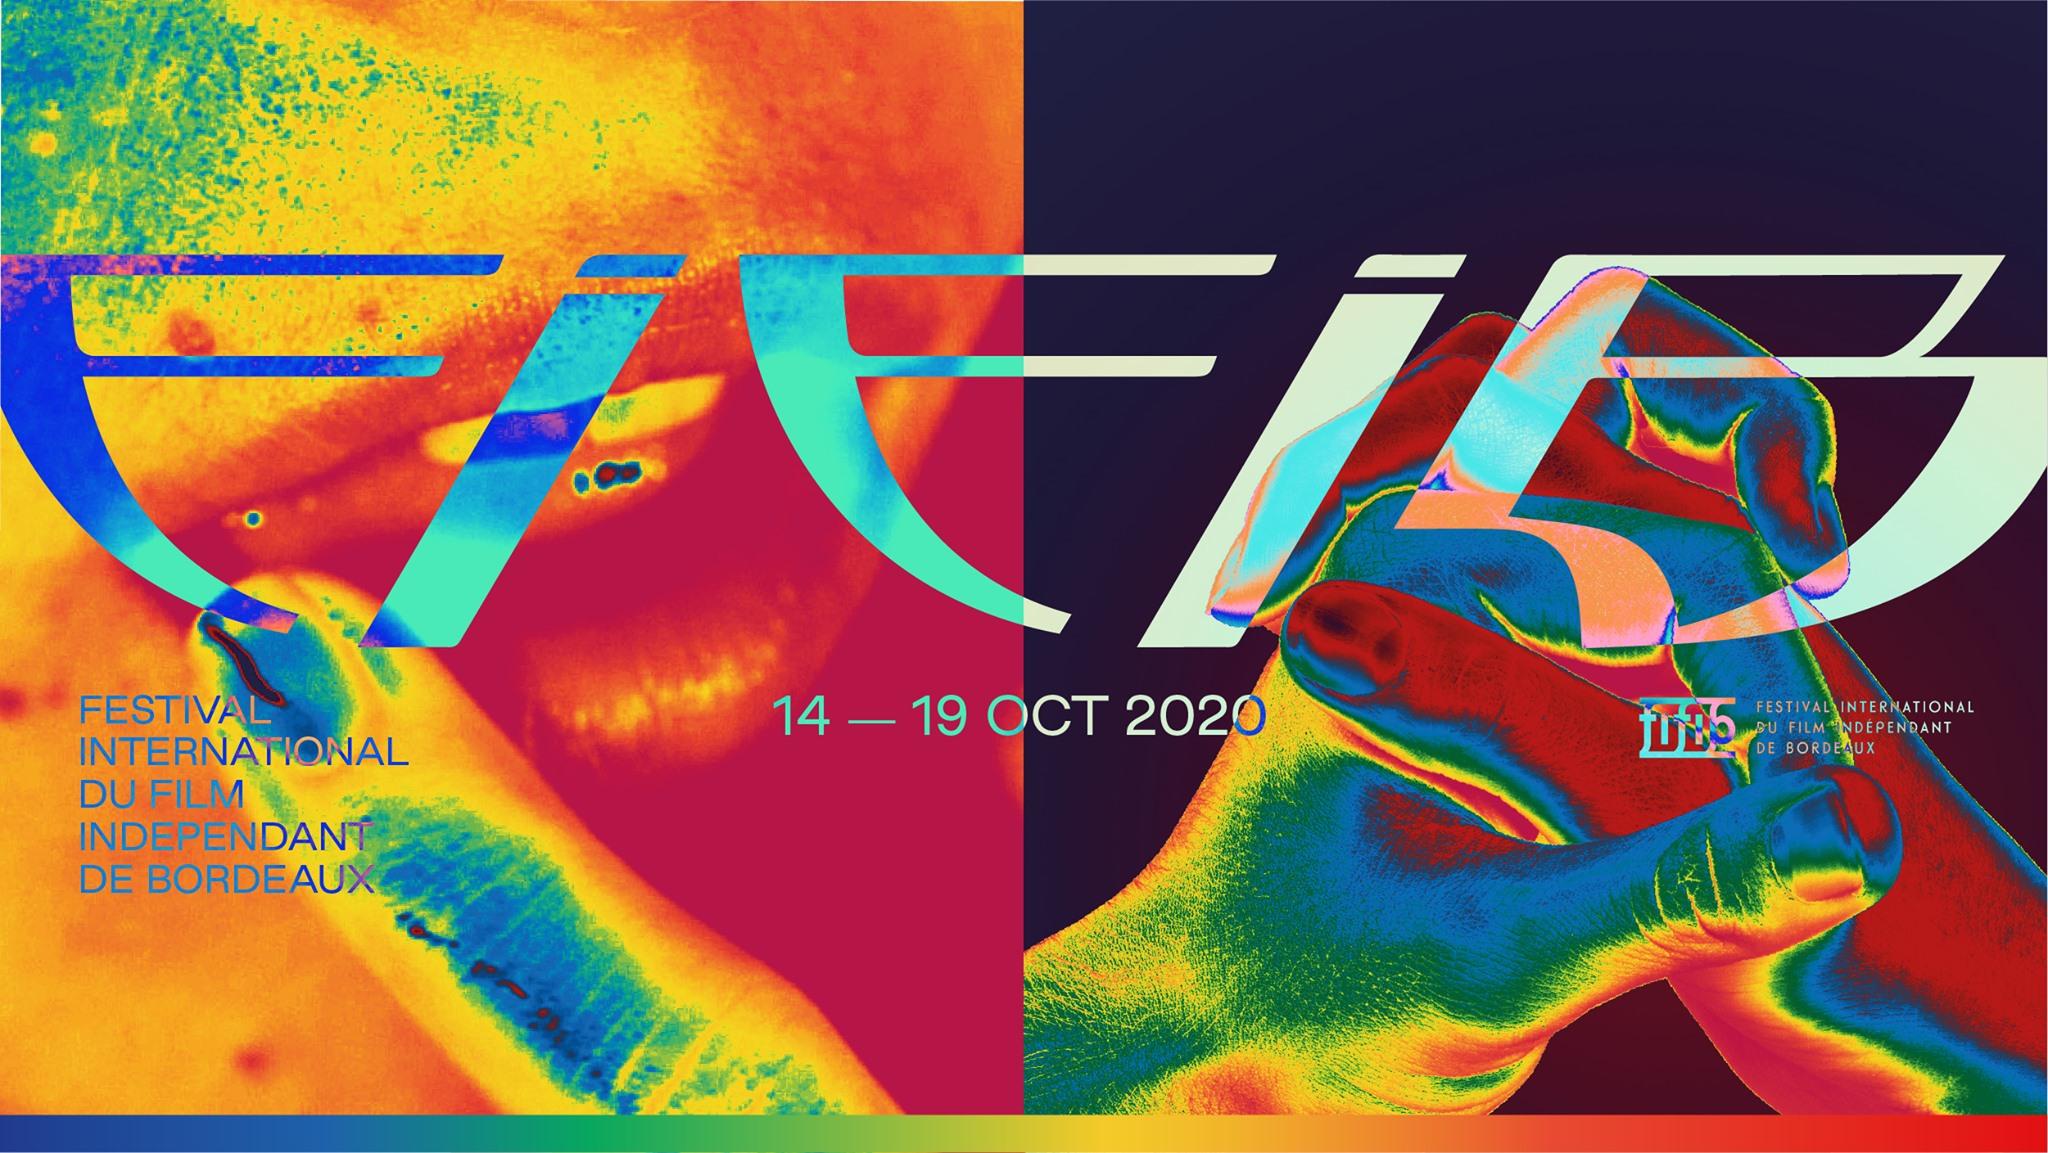 https://the-place-to-be.fr/wp-content/uploads/2020/09/fifib-festival-international-film-bordeaux-2020.jpg